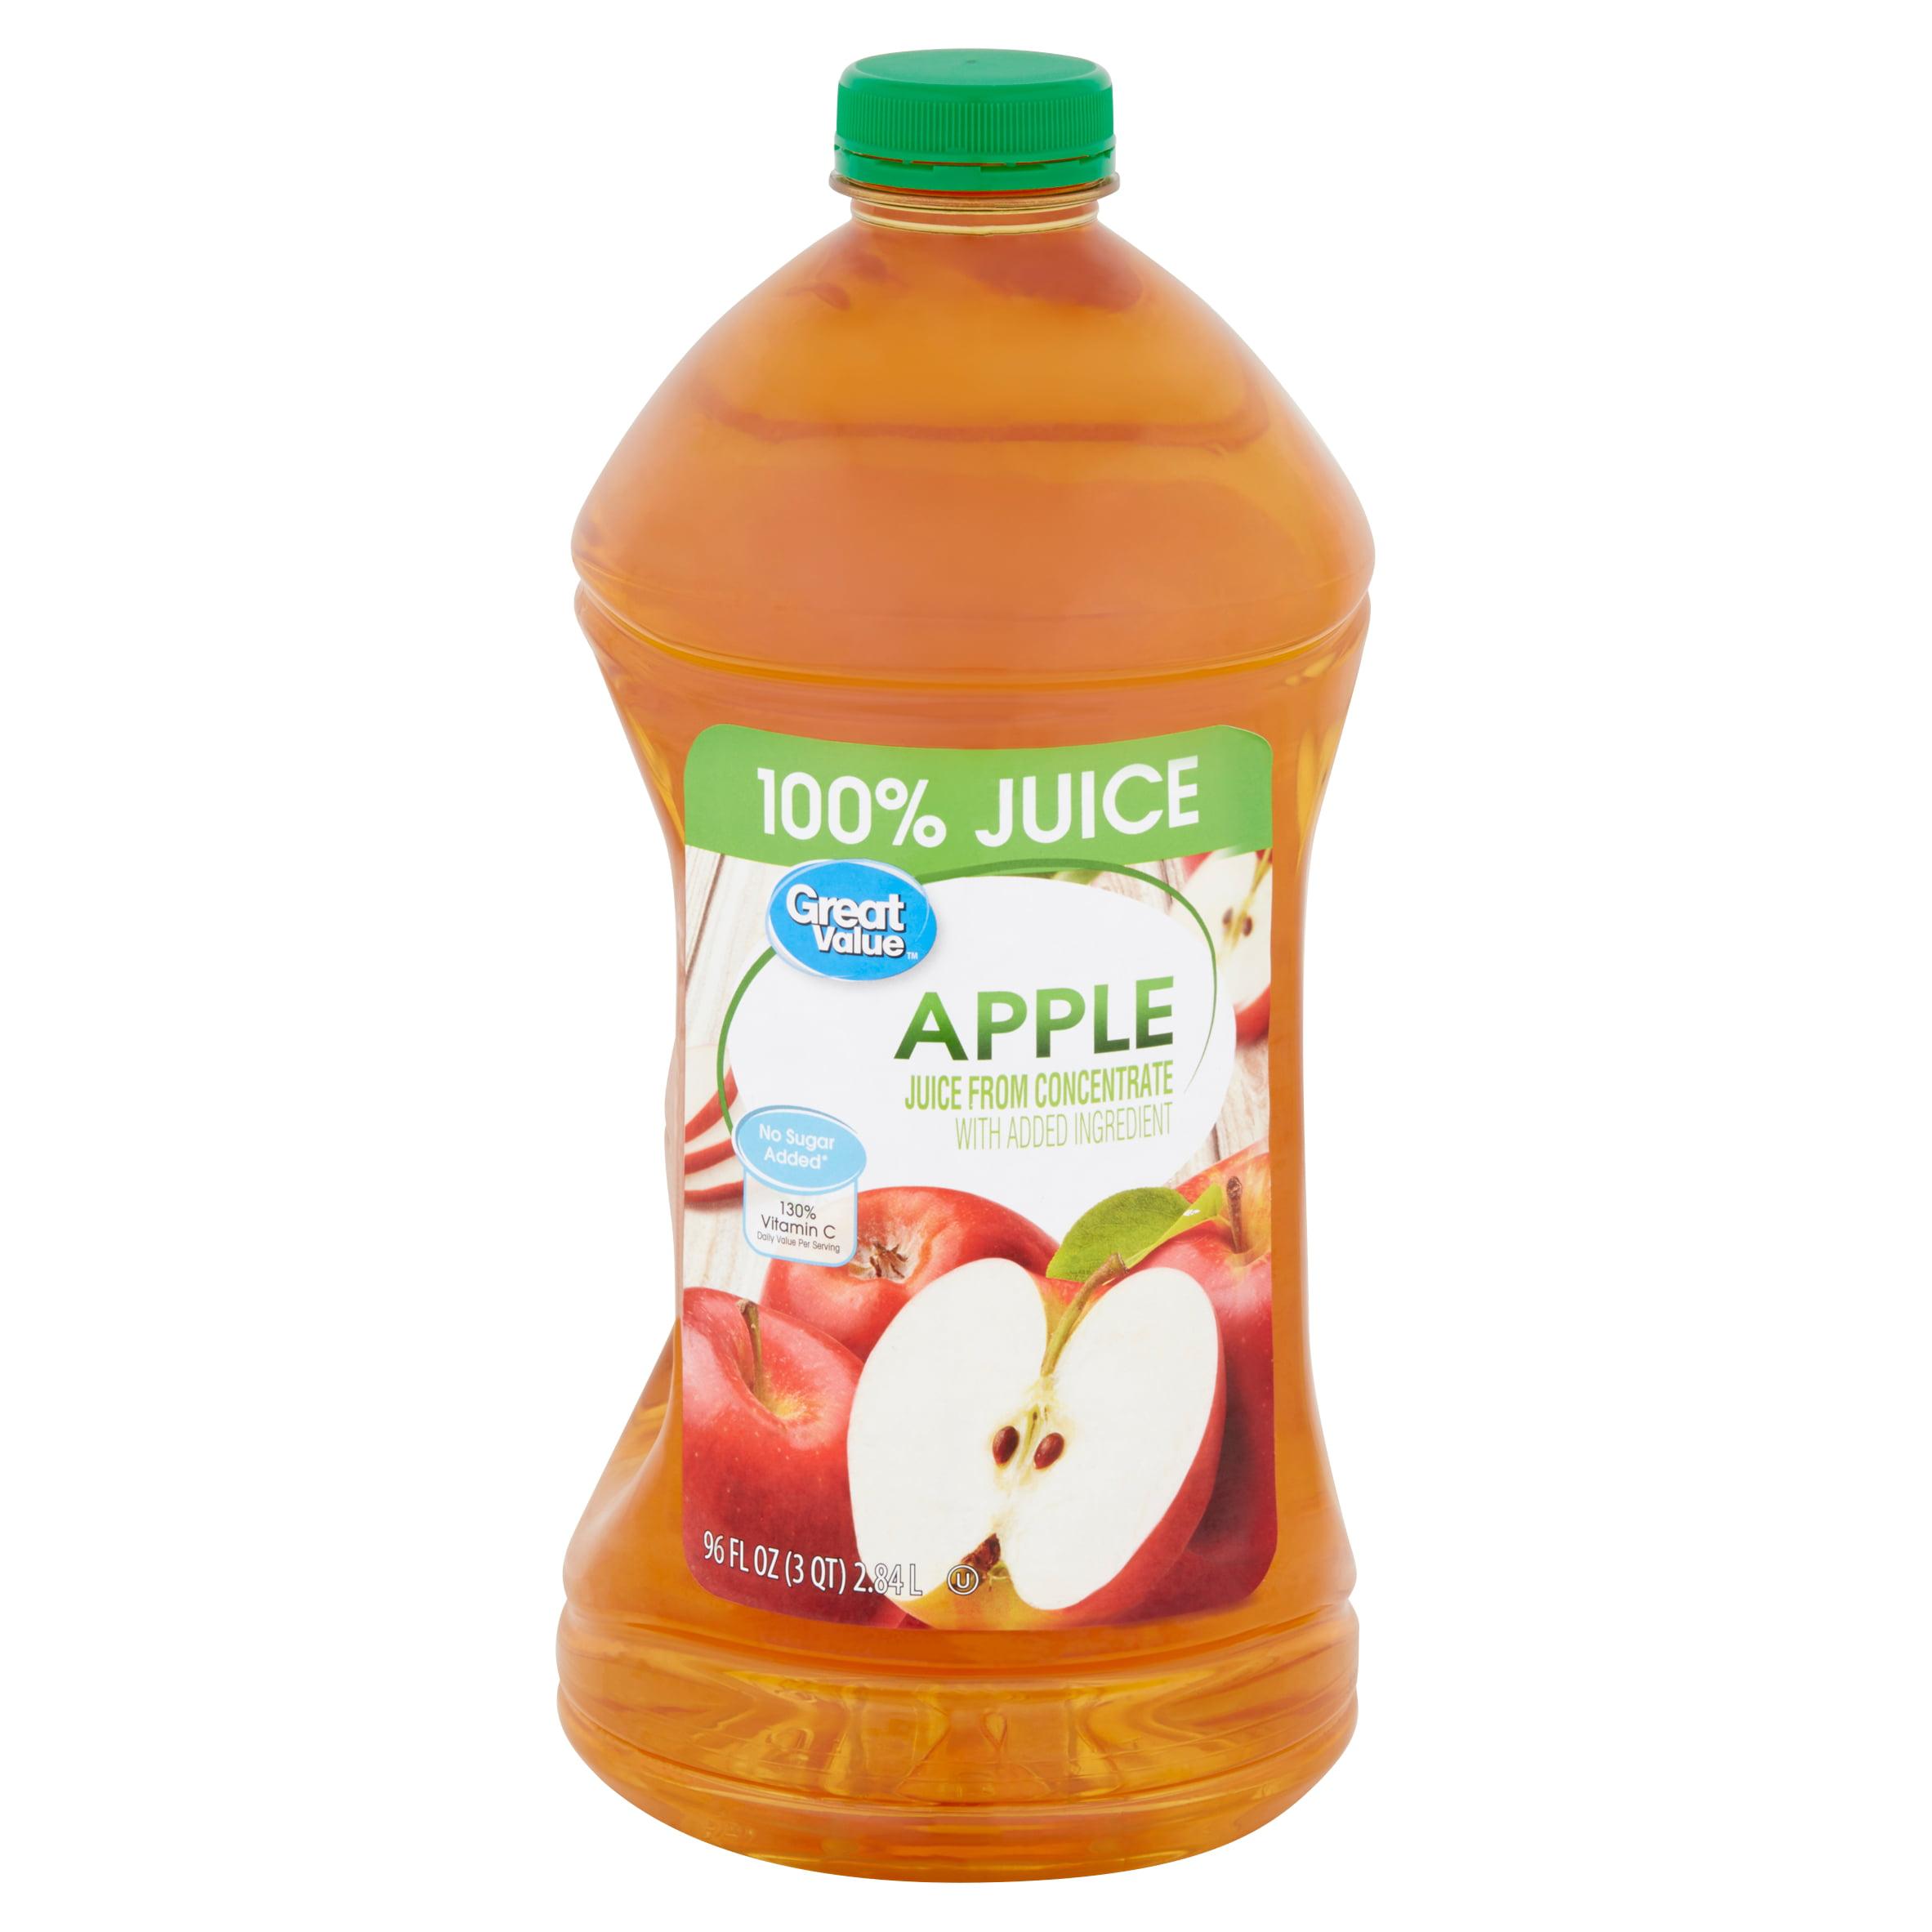 Great Value 100% Apple Juice, 96 Fl. Oz.